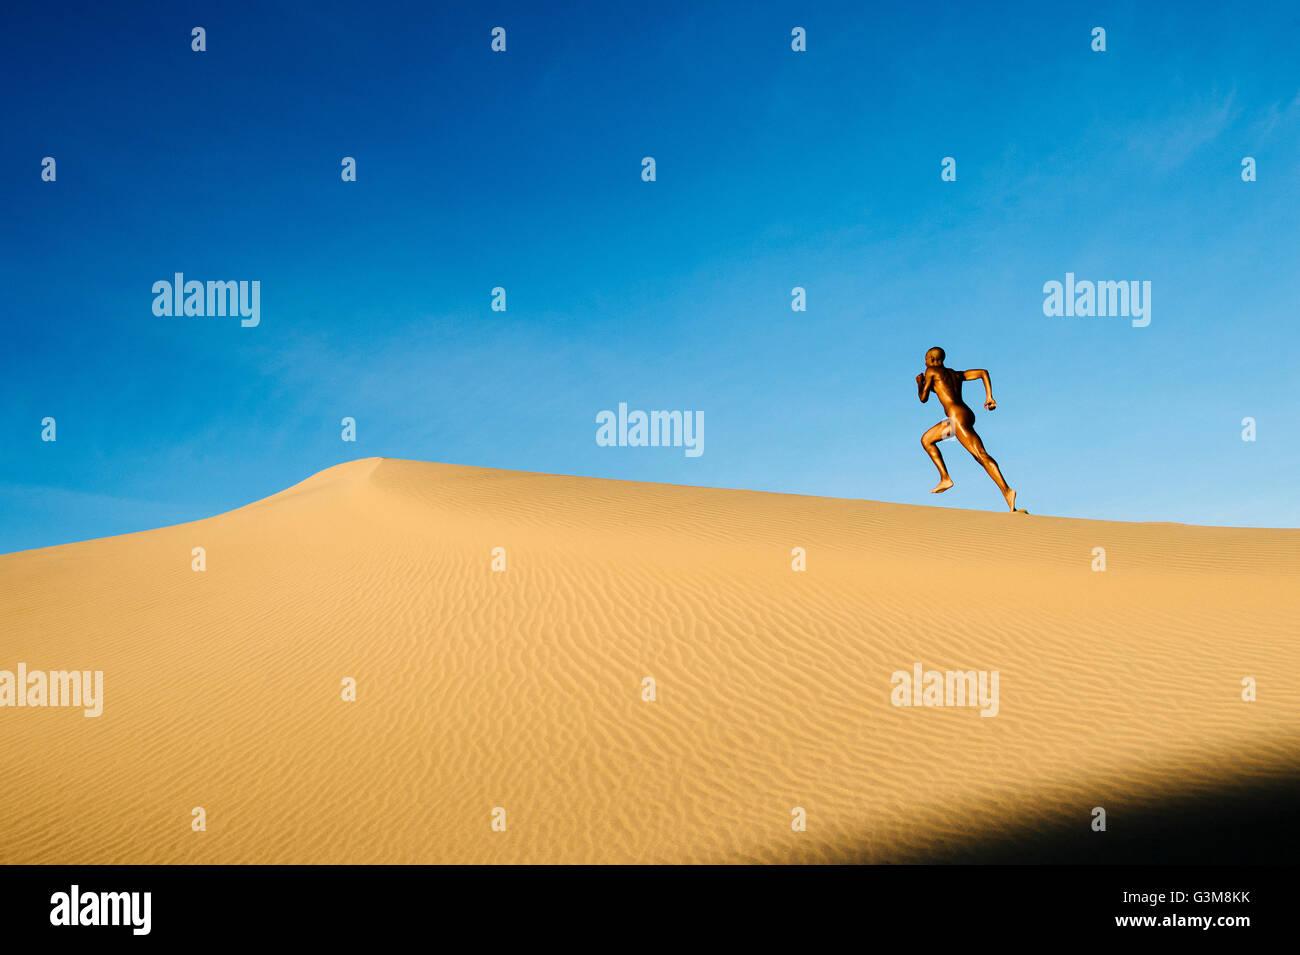 Nude woman in desert running on dune - Stock Image